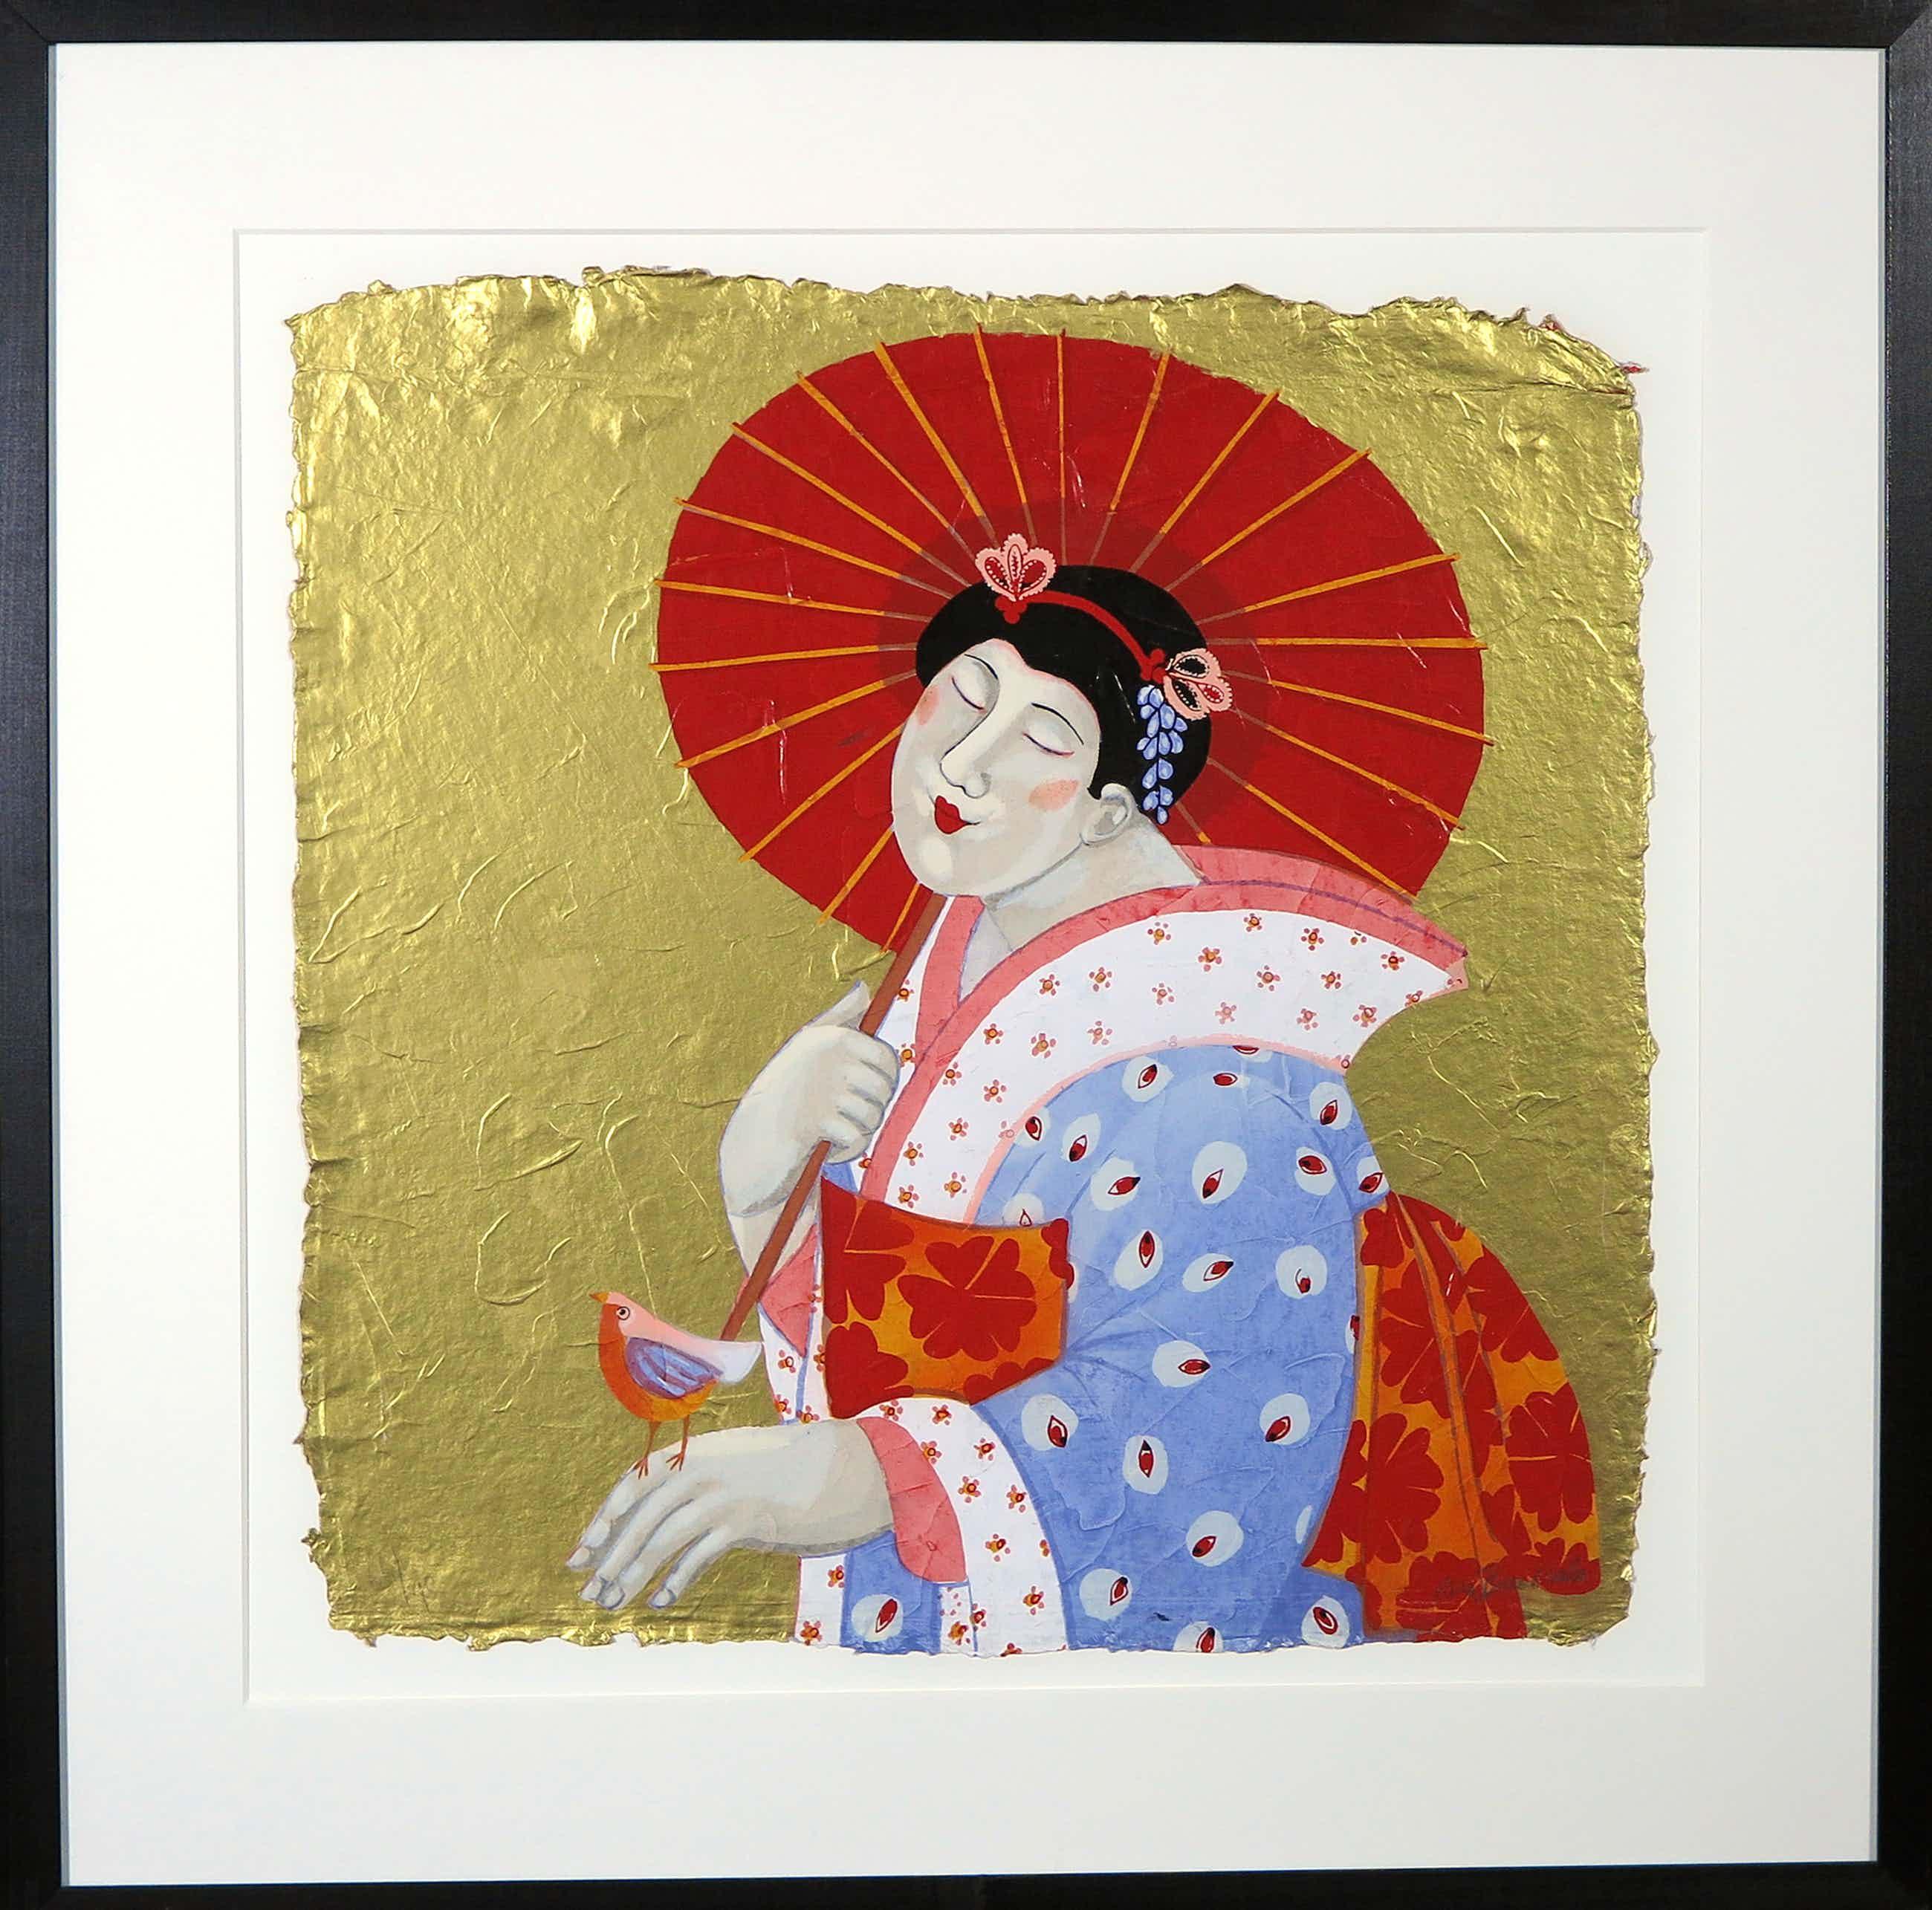 Ada Breedveld - Zeefdruk, Femmes Japonnais II - Ingelijst kopen? Bied vanaf 80!